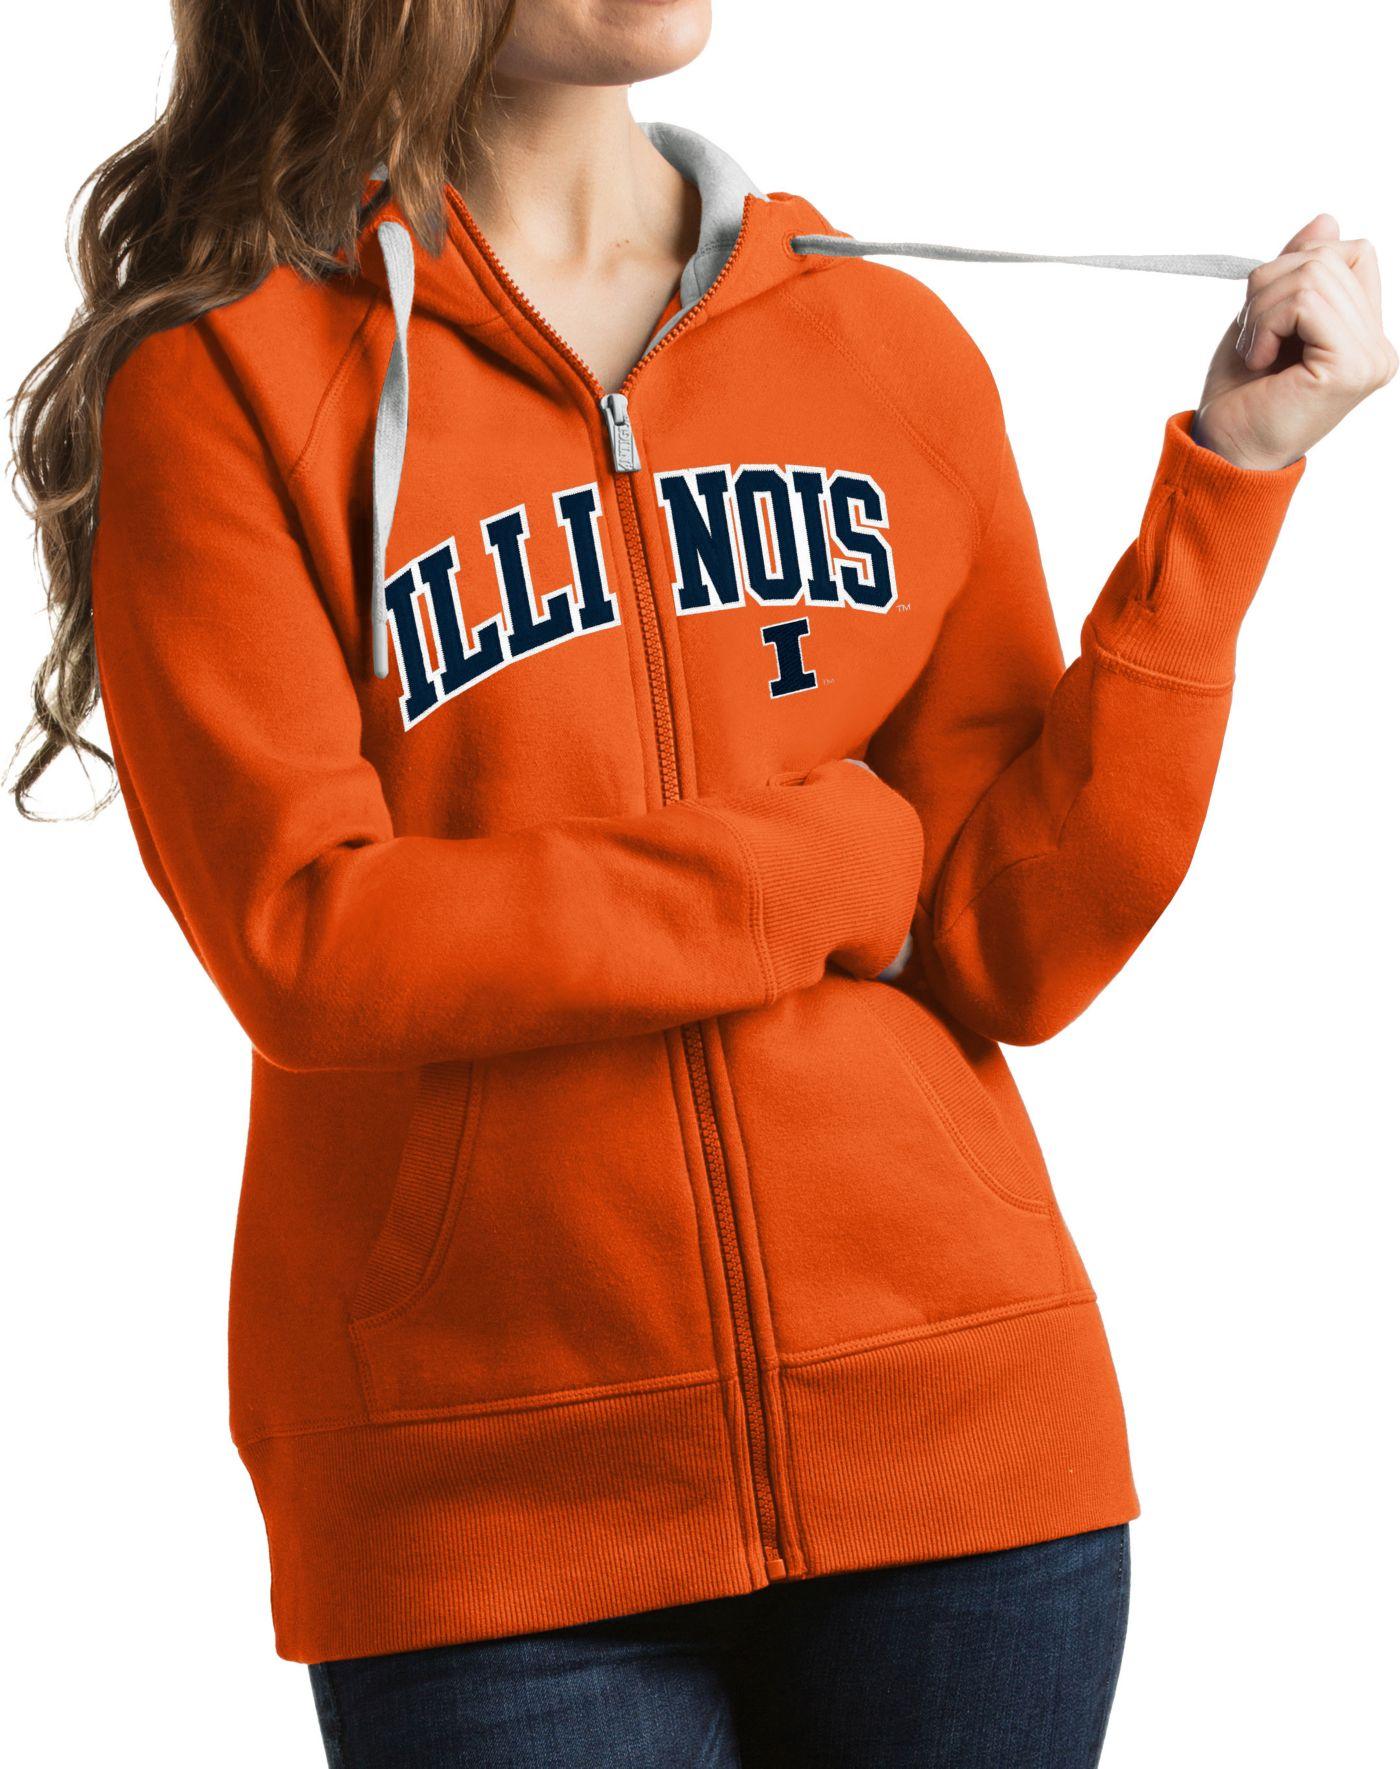 Antigua Women's Illinois Fighting Illini Orange Victory Full-Zip Hoodie